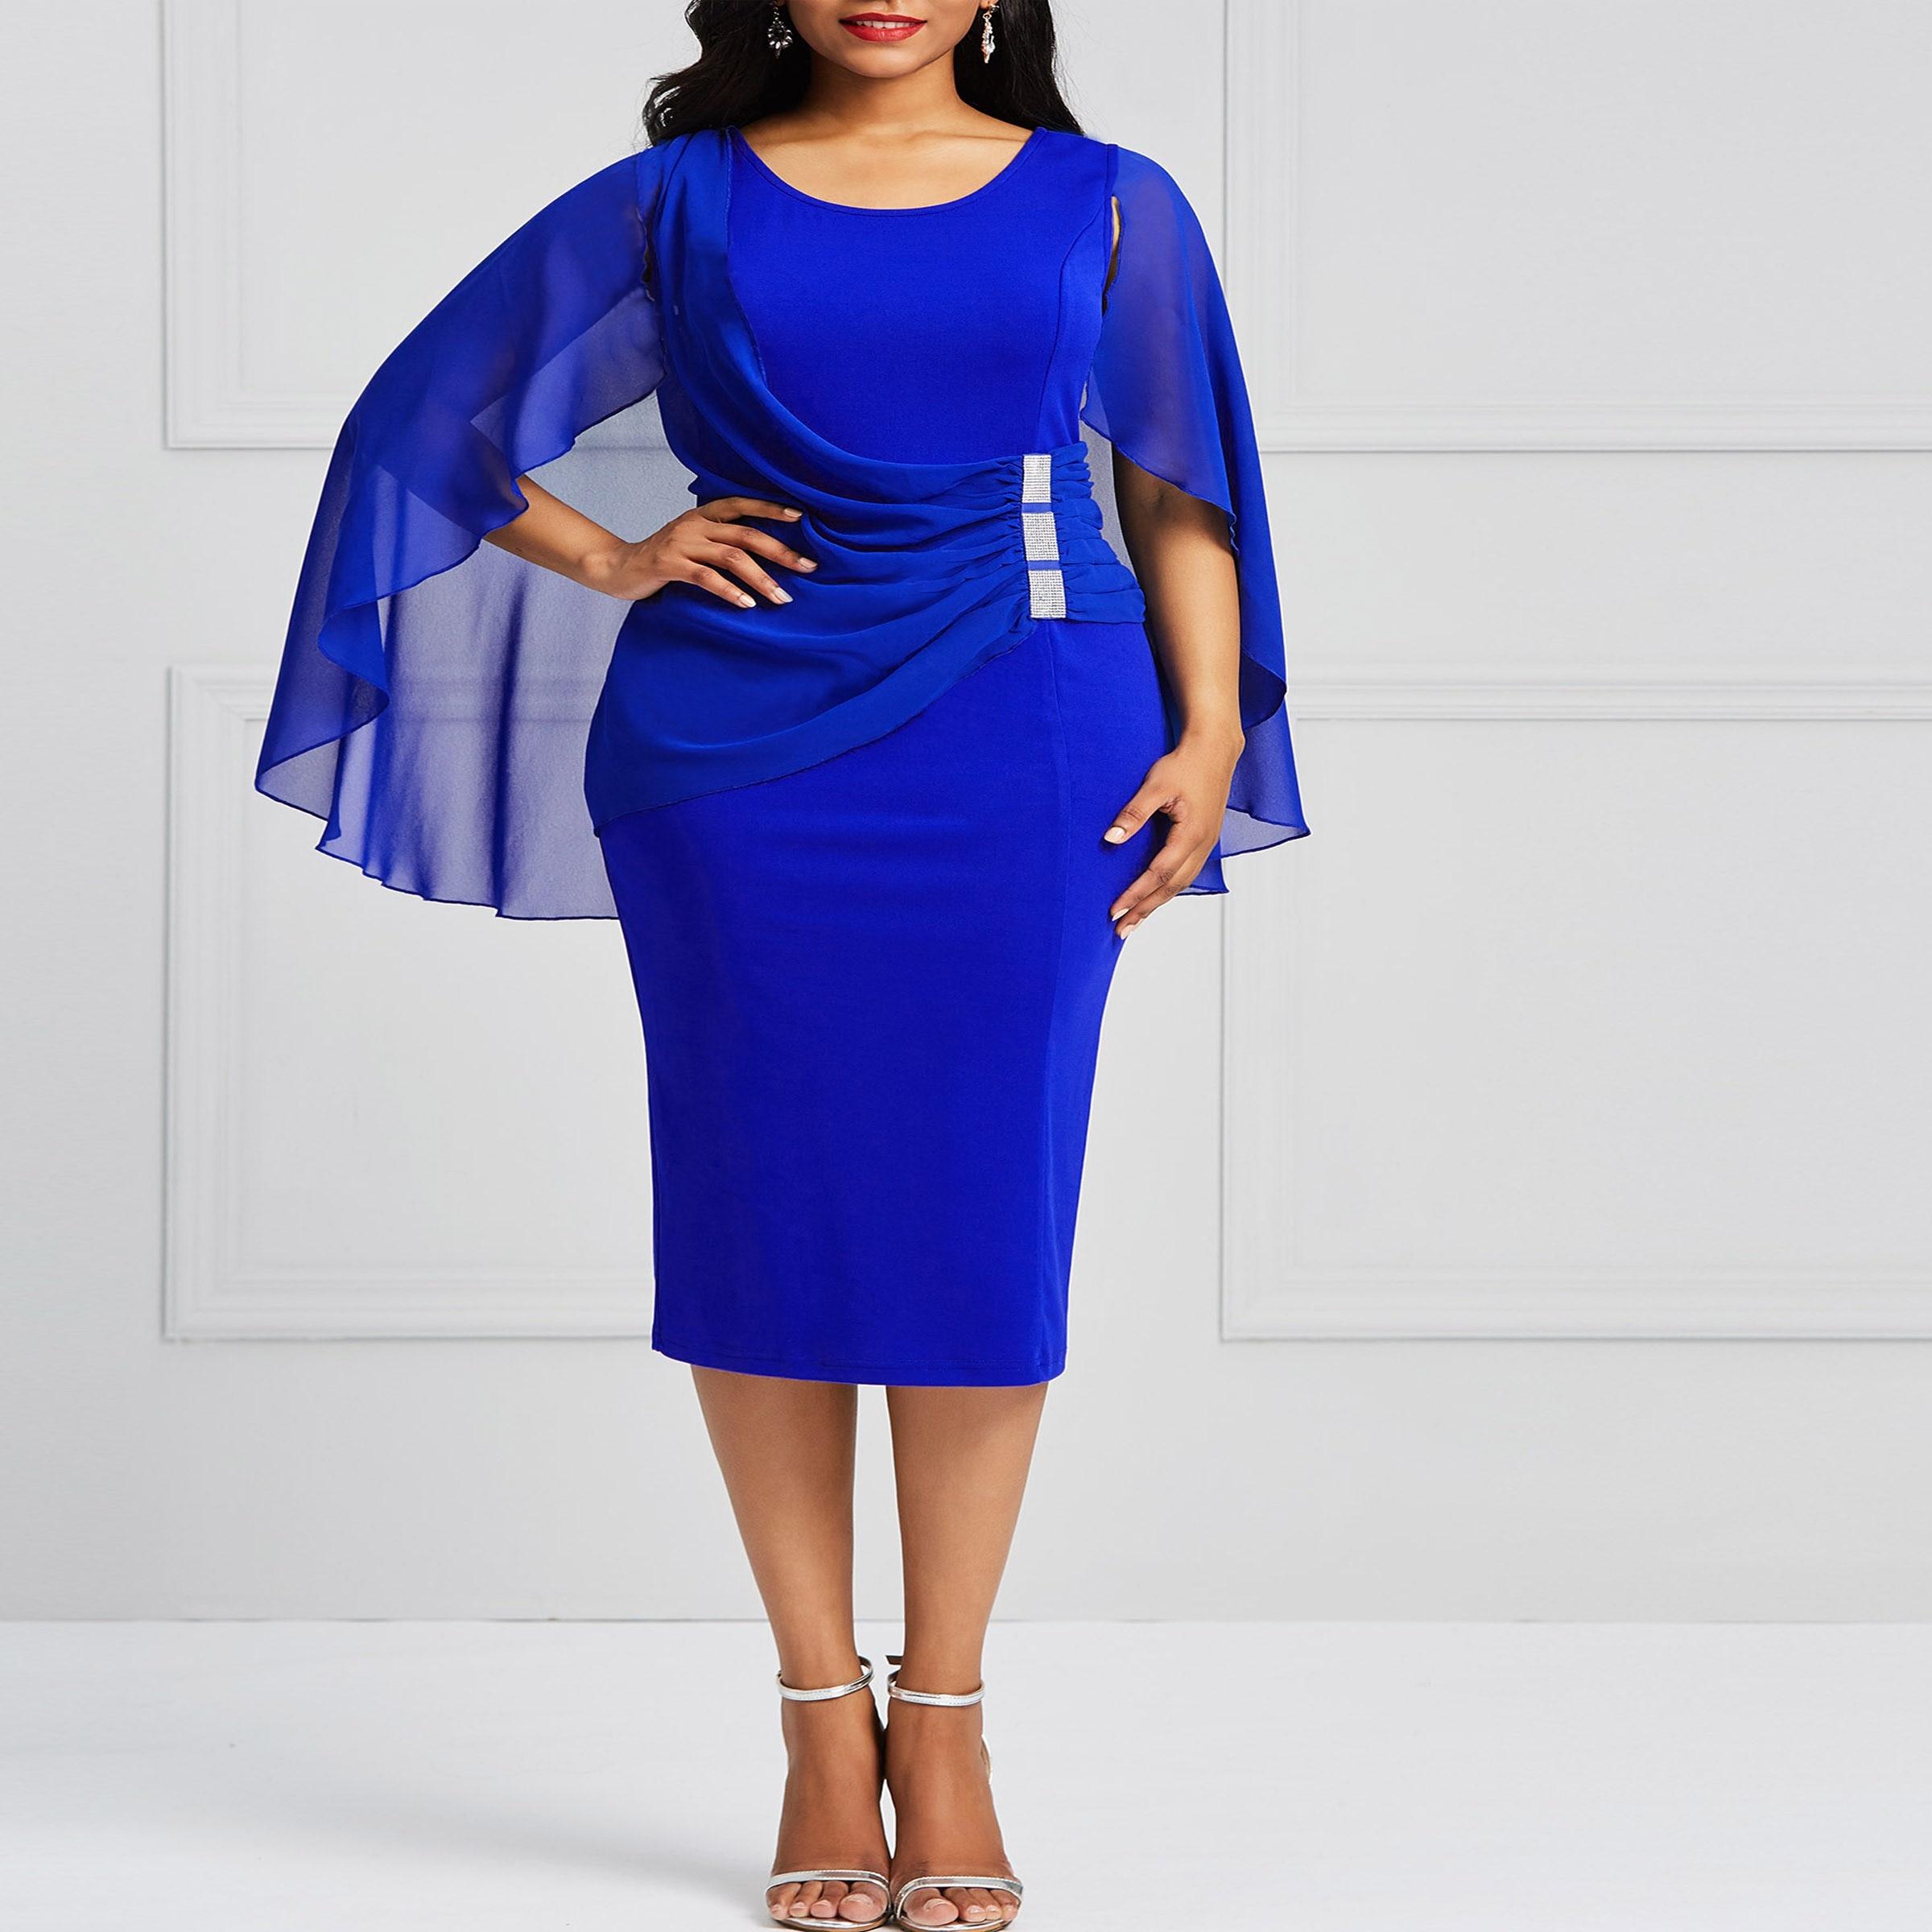 6952b35150 Plus size blue women dress autumn 2018 bodycon batwing sleeve pencil ...